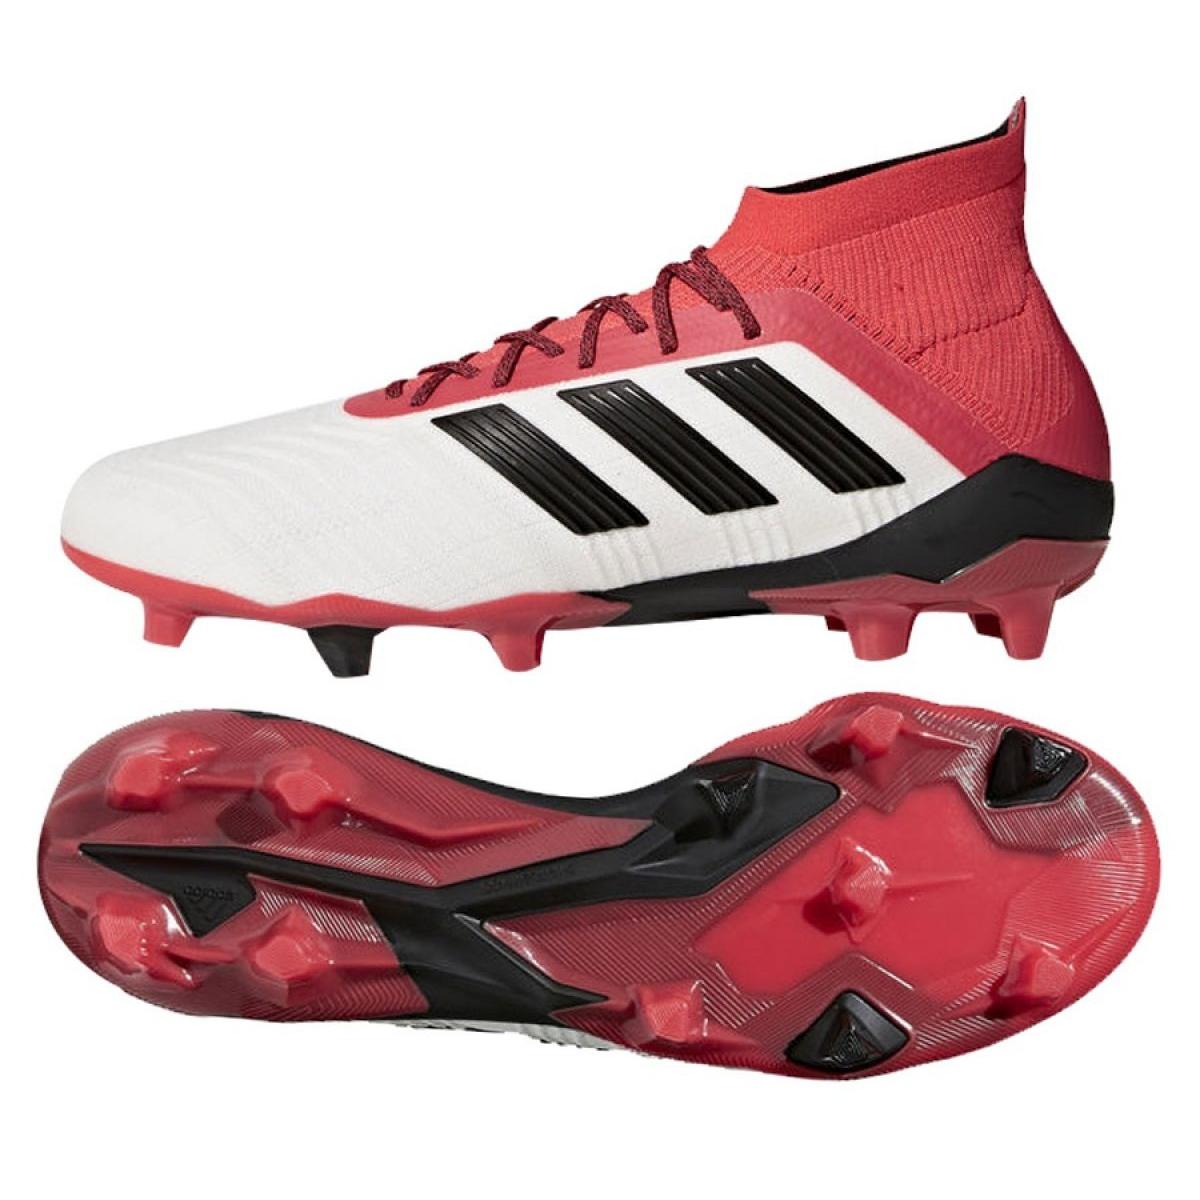 uomo vasta gamma ultima moda Scarpe da calcio adidas Predator 18.1 Fg M CM7410